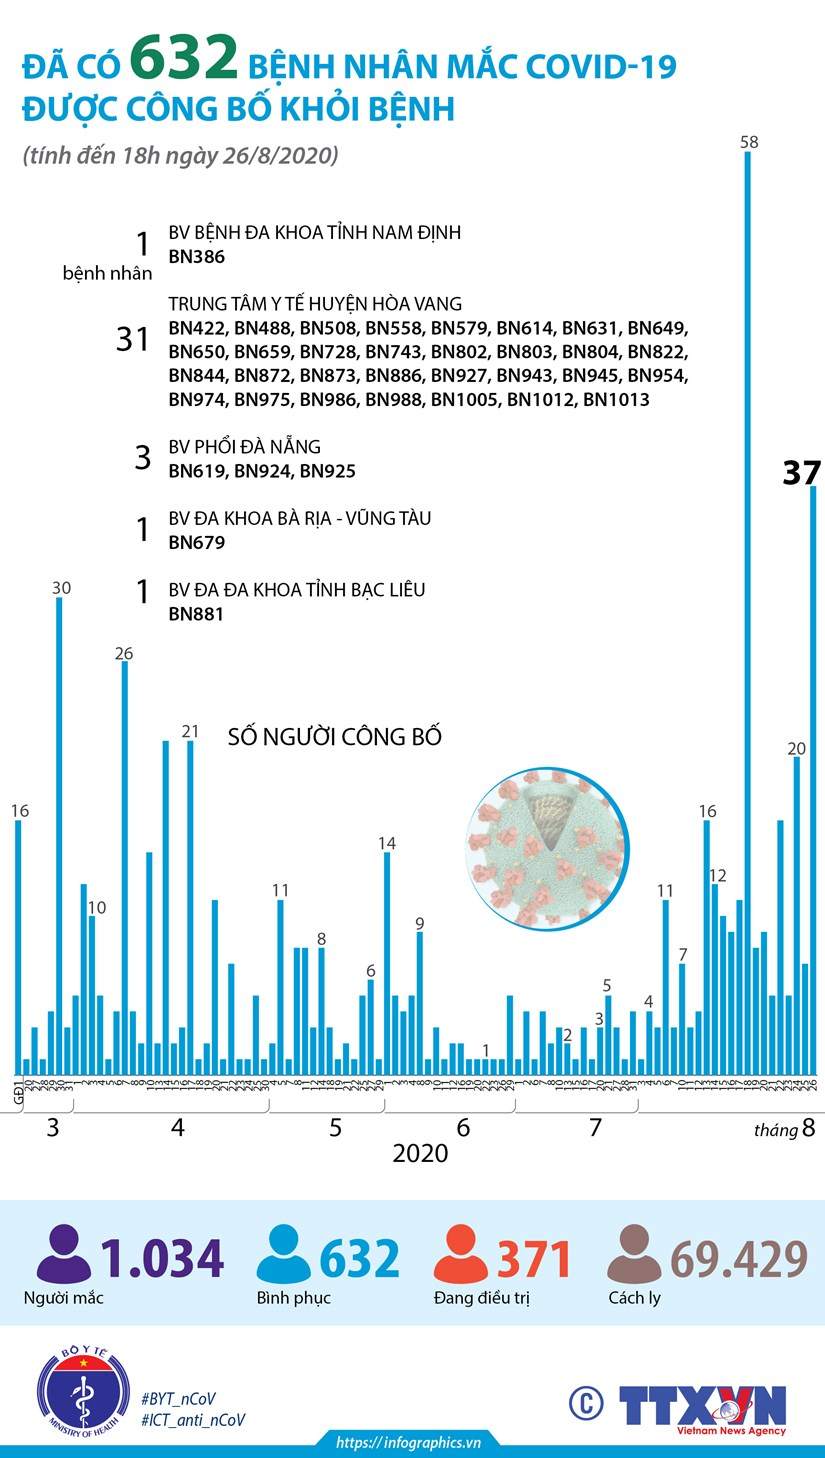 [Infographics] Da co 632 benh nhan mac COVID-19 duoc cong bo khoi benh hinh anh 1